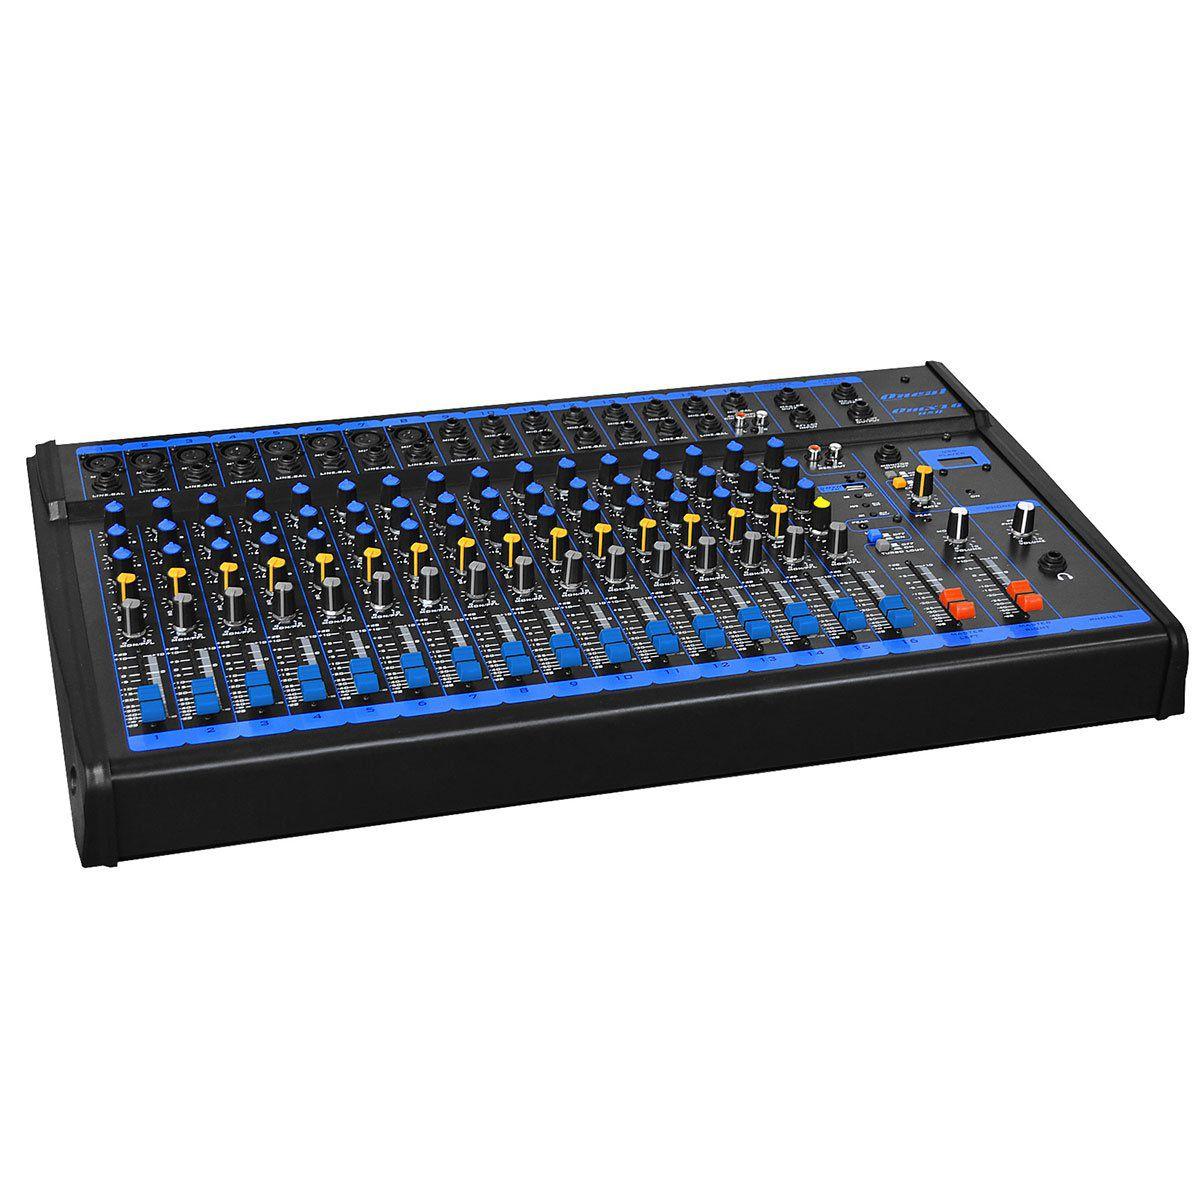 Mesa de Som 16 Canais XLR Balanceados c/ USB - OMX 16 USB Oneal